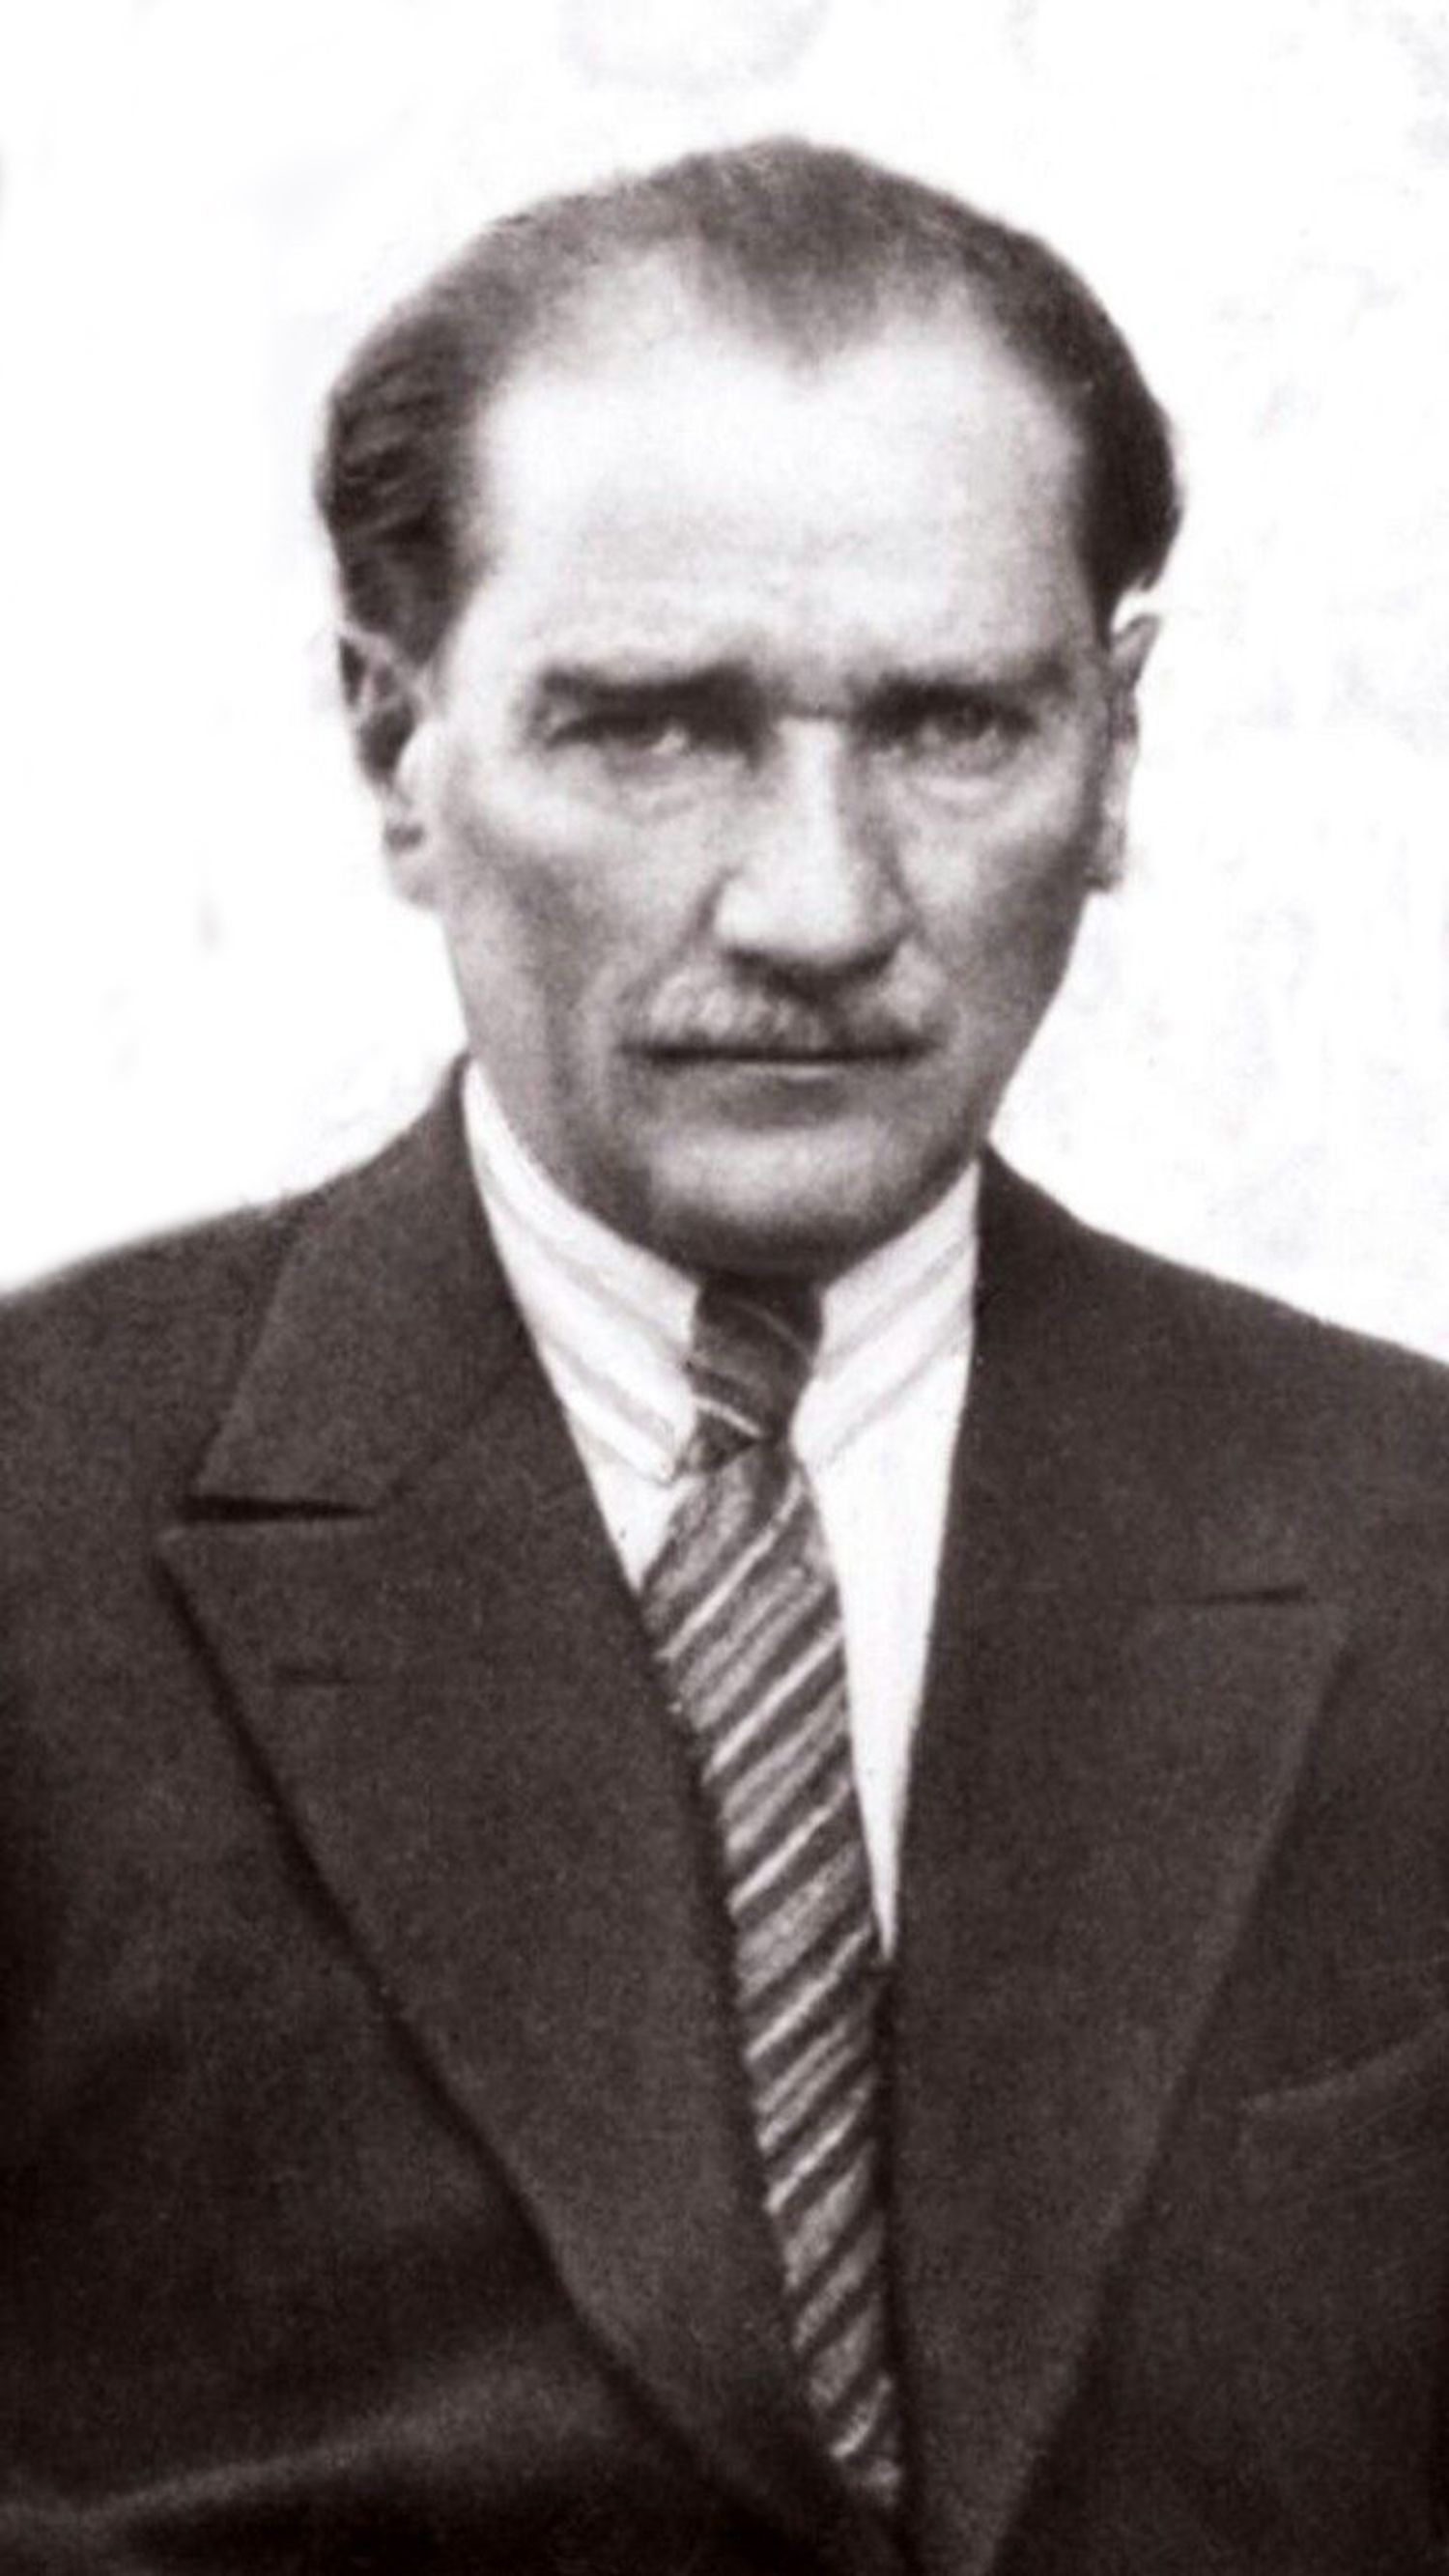 Gazi Mustafa Kemal Ataturk Resim Portre Siyah Beyaz